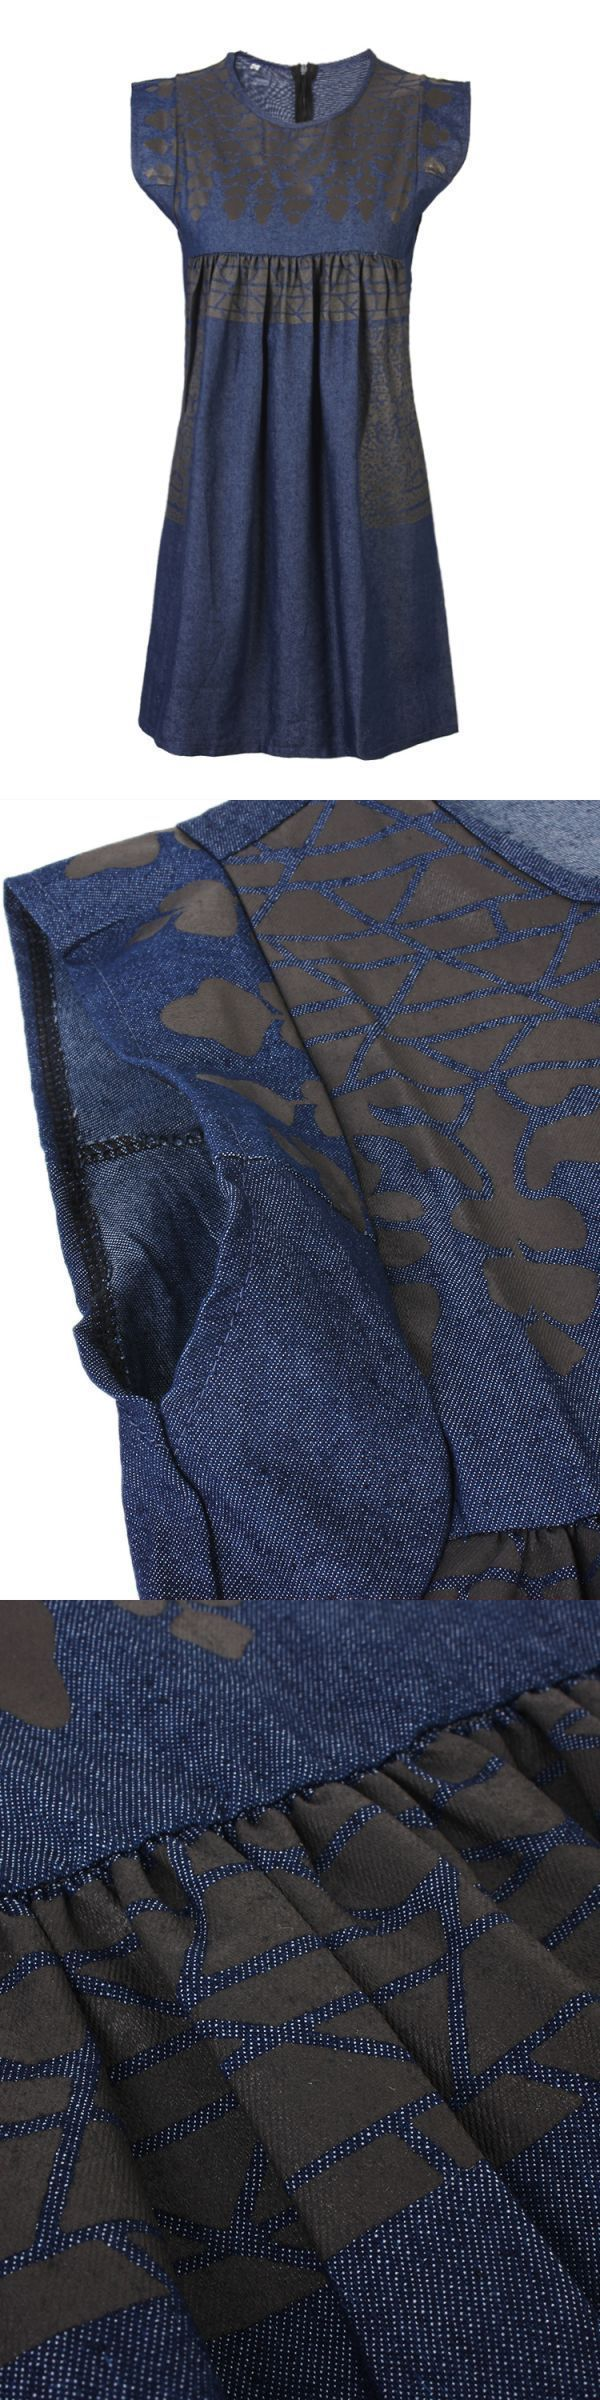 Casual women vintage sleeveless printing denim blue mini dress casual dresses for juniors forever 21 #casual #dresses #empire #waist #casual #dresses #next #casual #dresses #next #day #delivery #jcpenney #casual #dresses